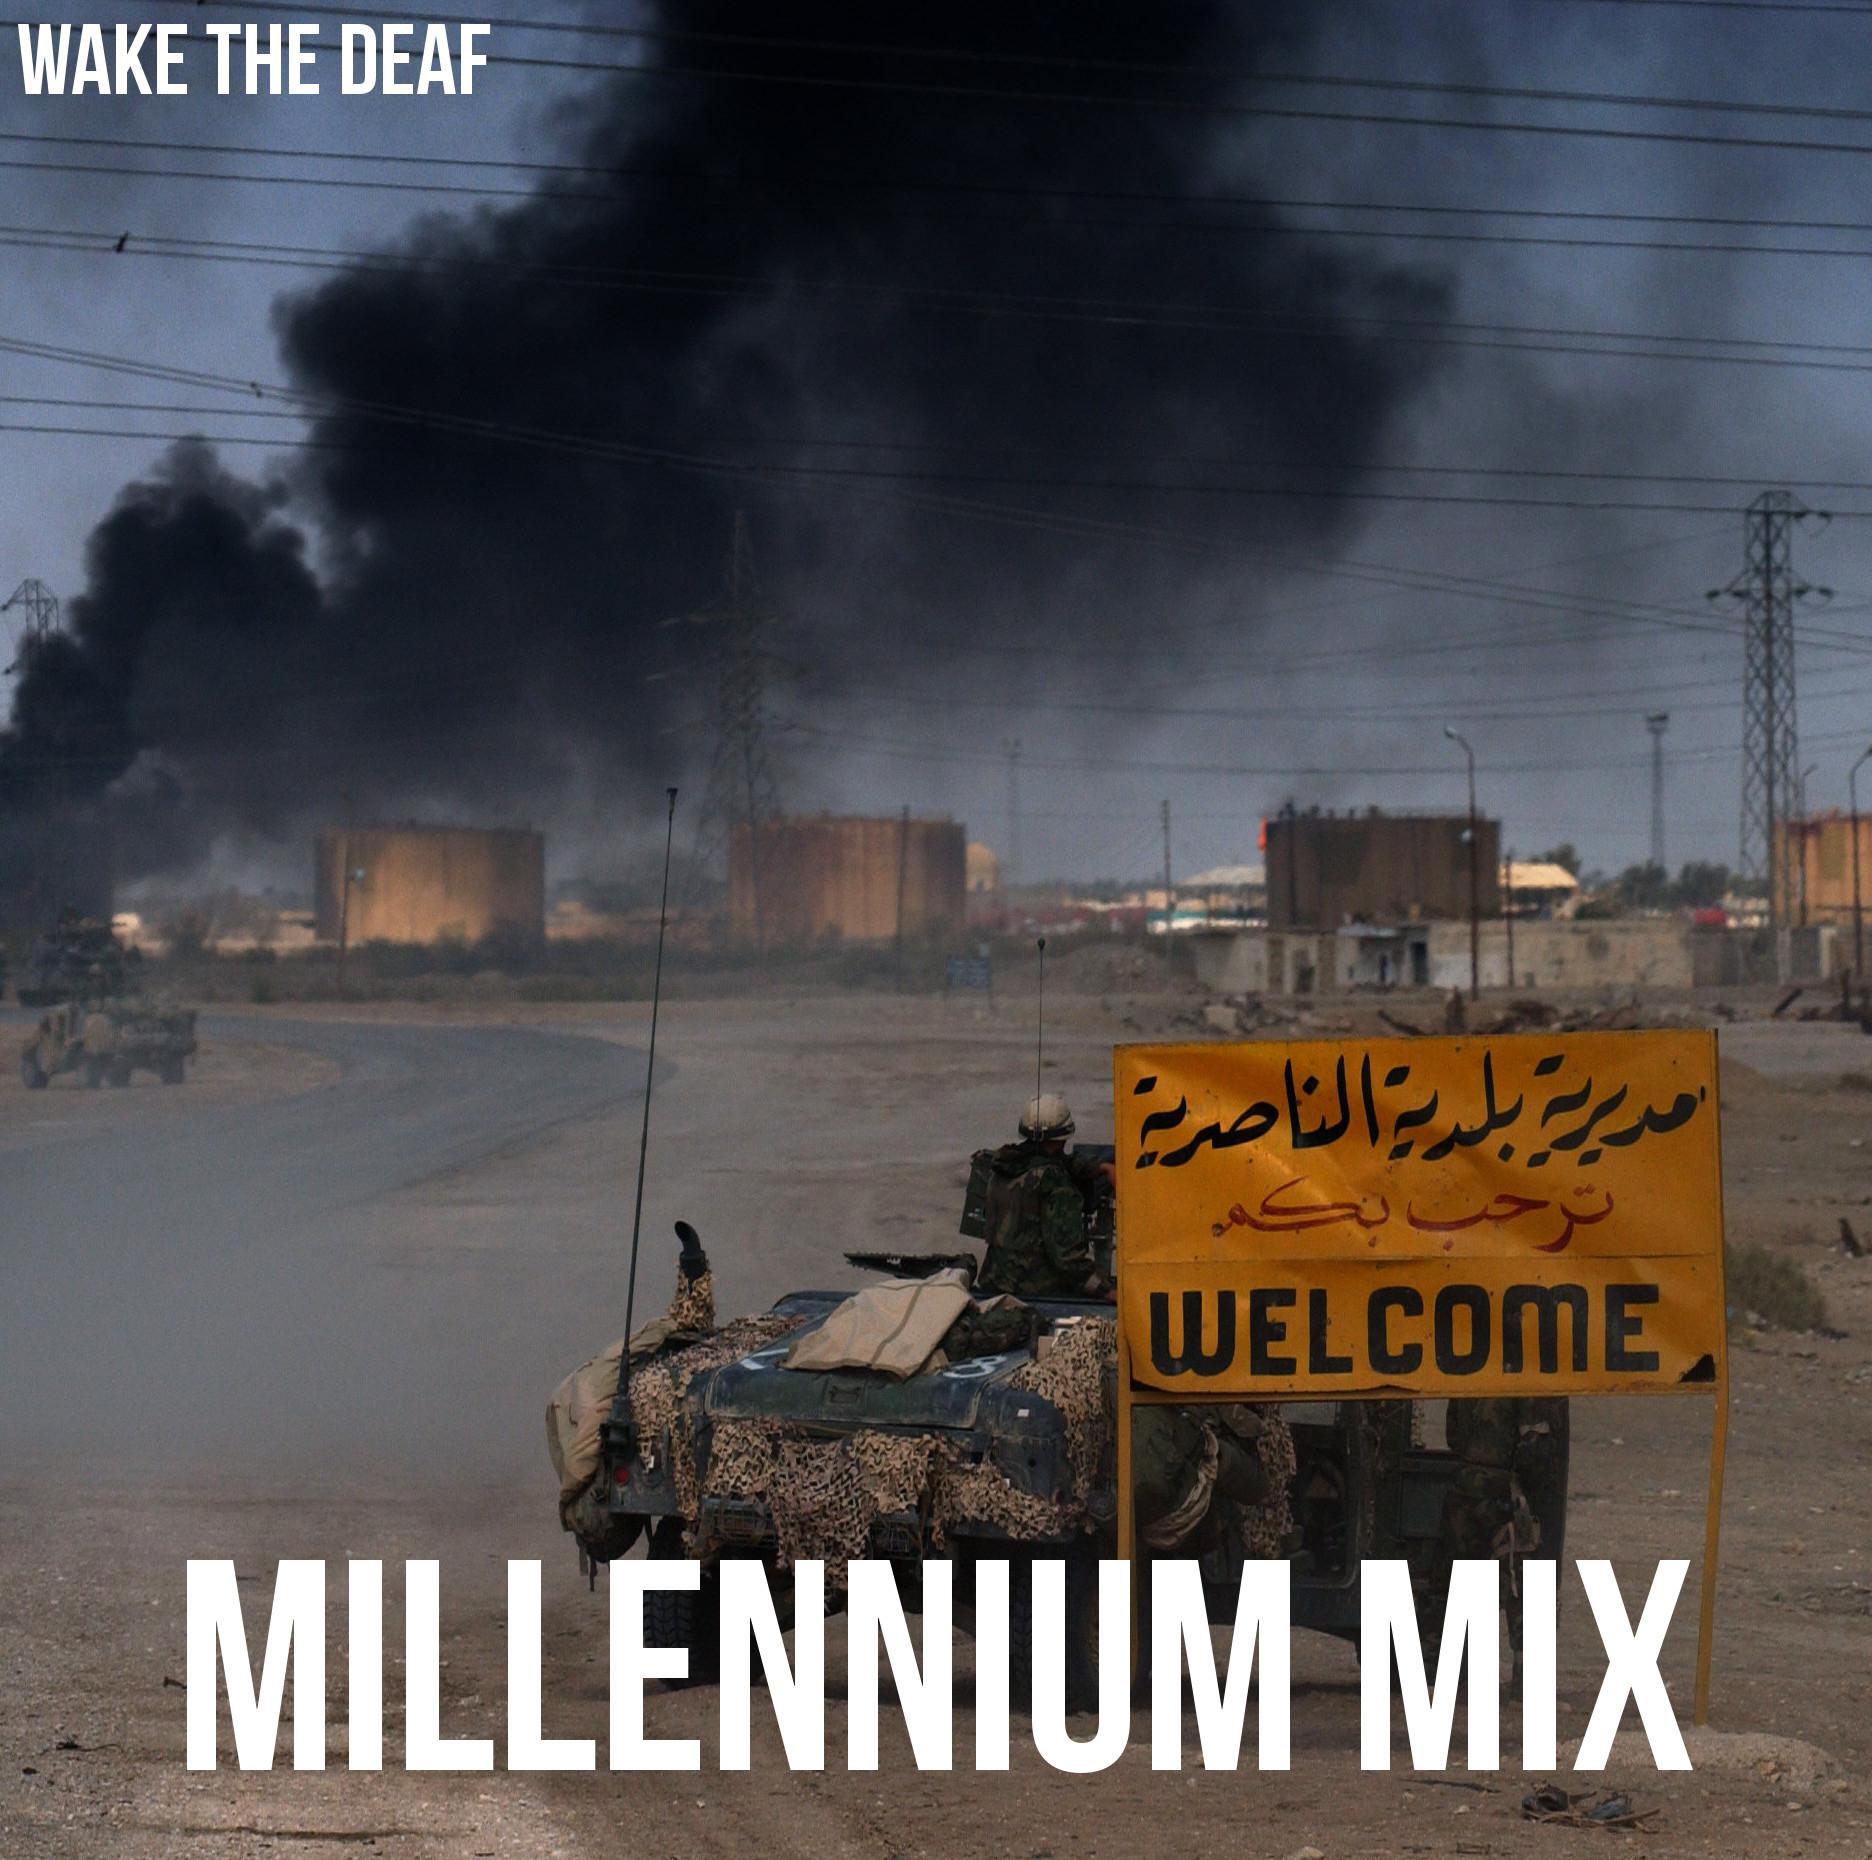 Millennium mix 2003